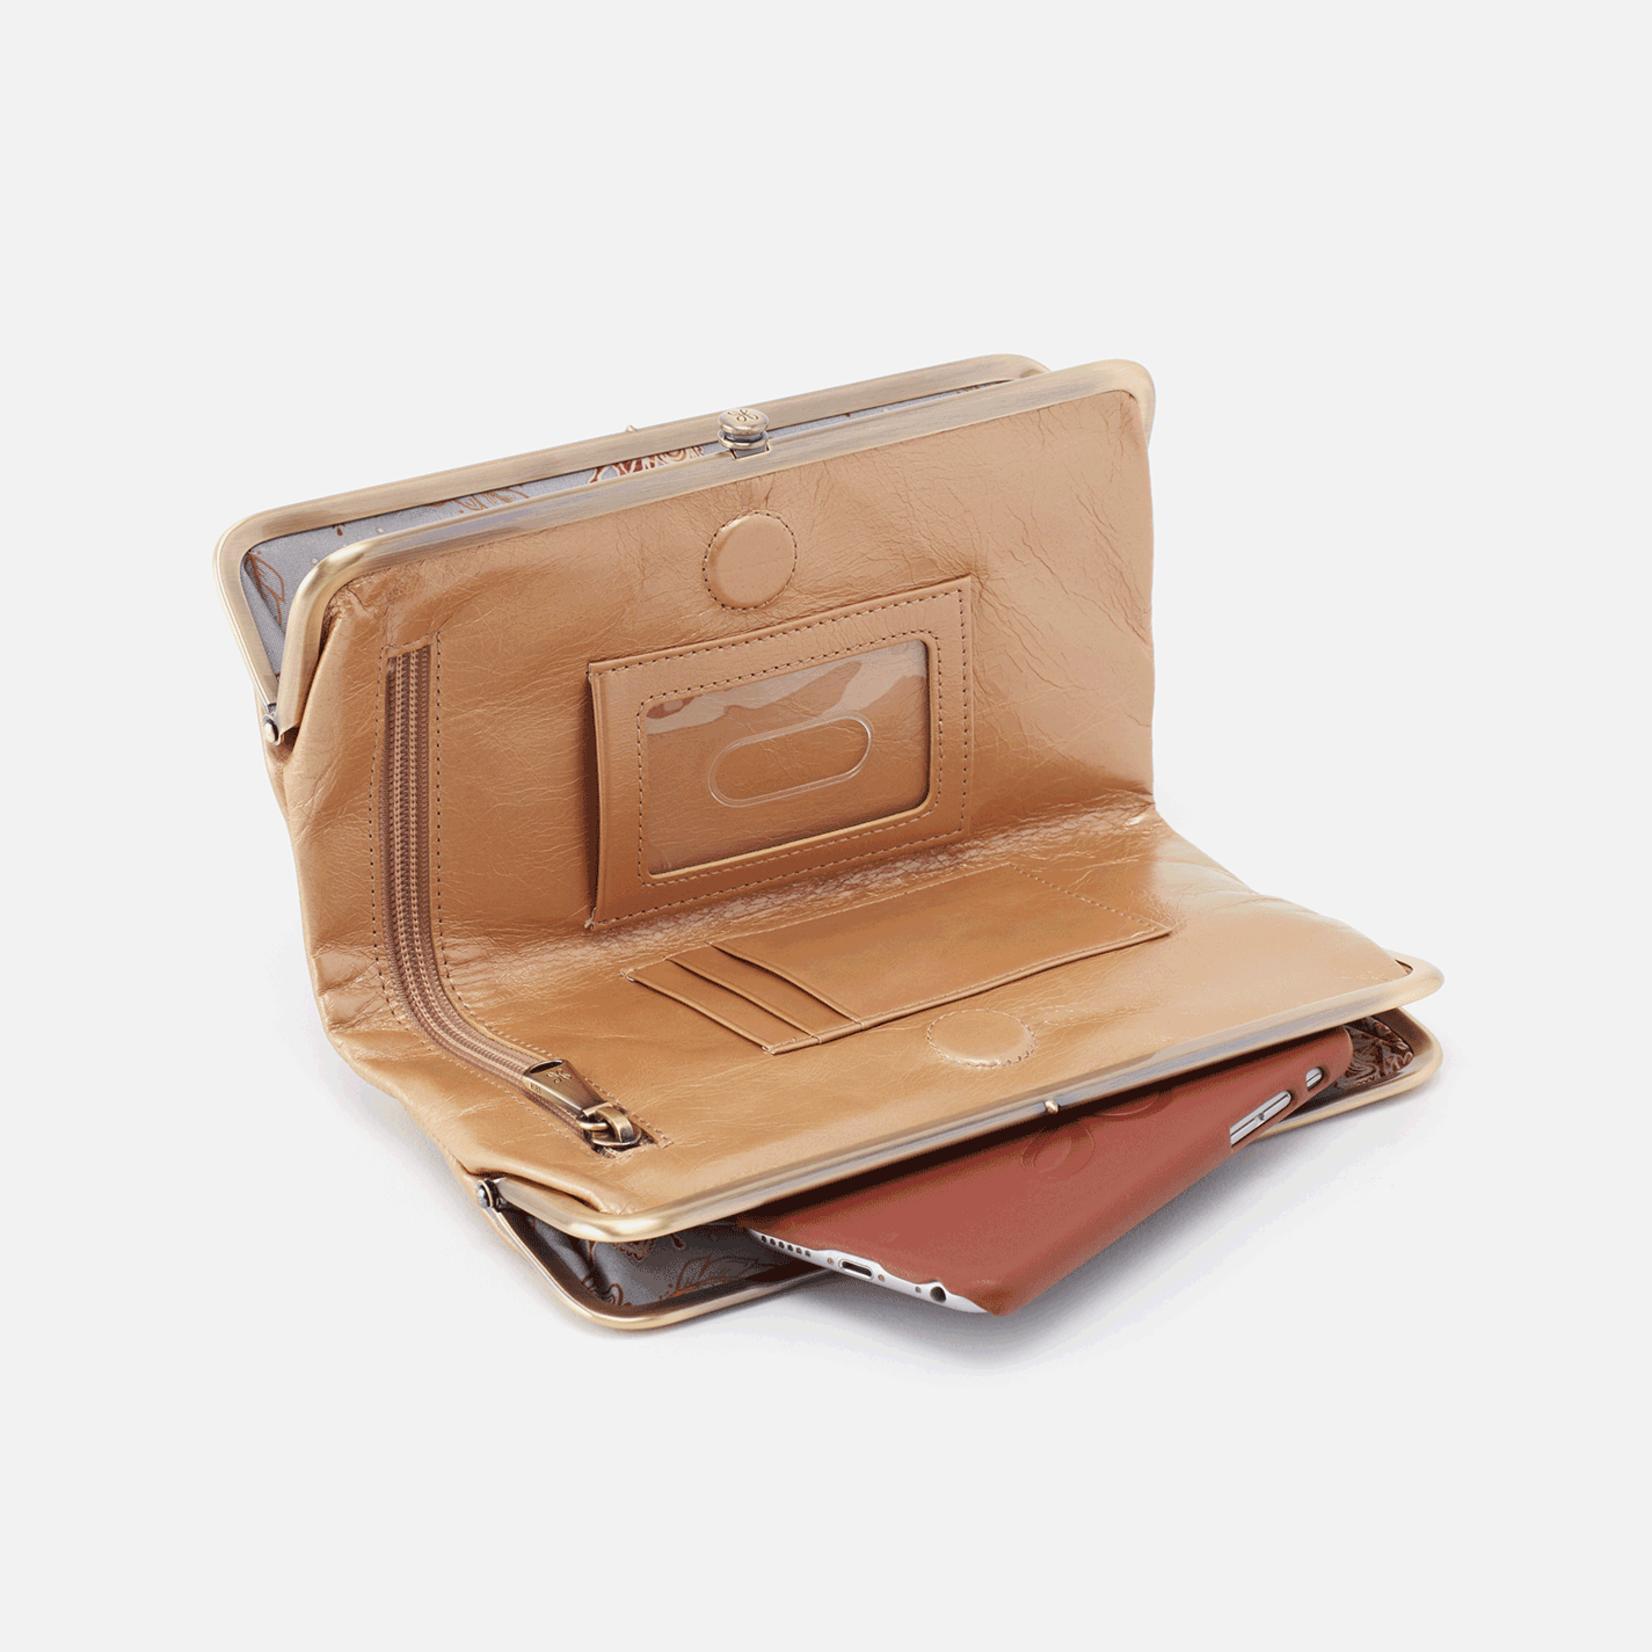 HOBO Lauren Gold Dust Leather Wallet/Clutch